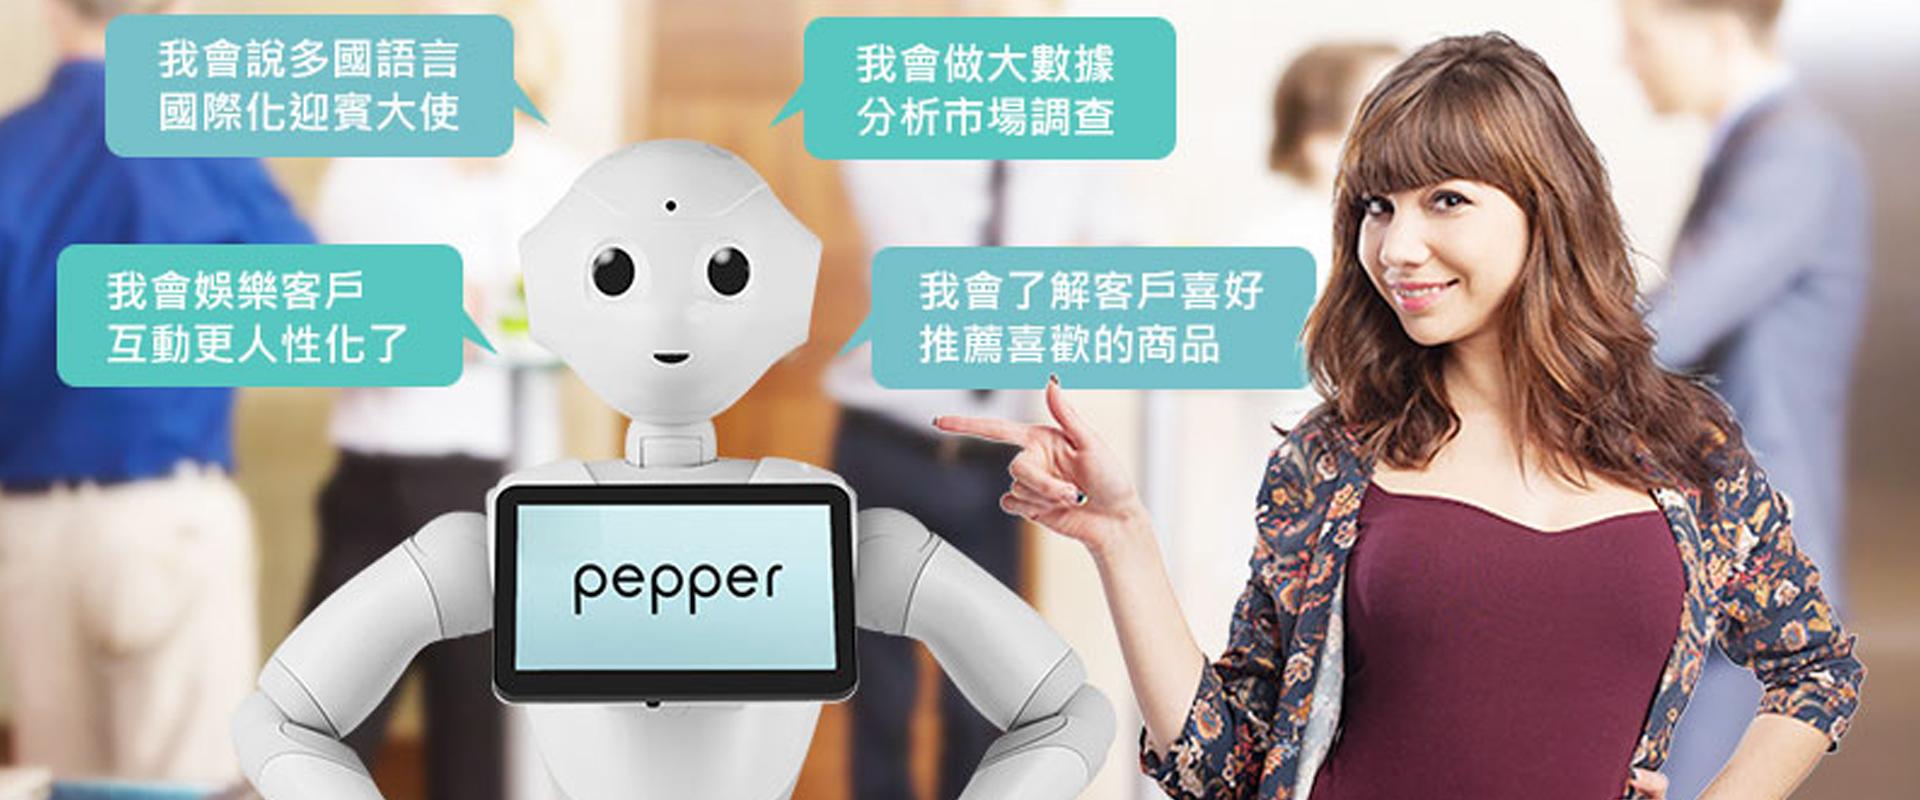 0713_pepper